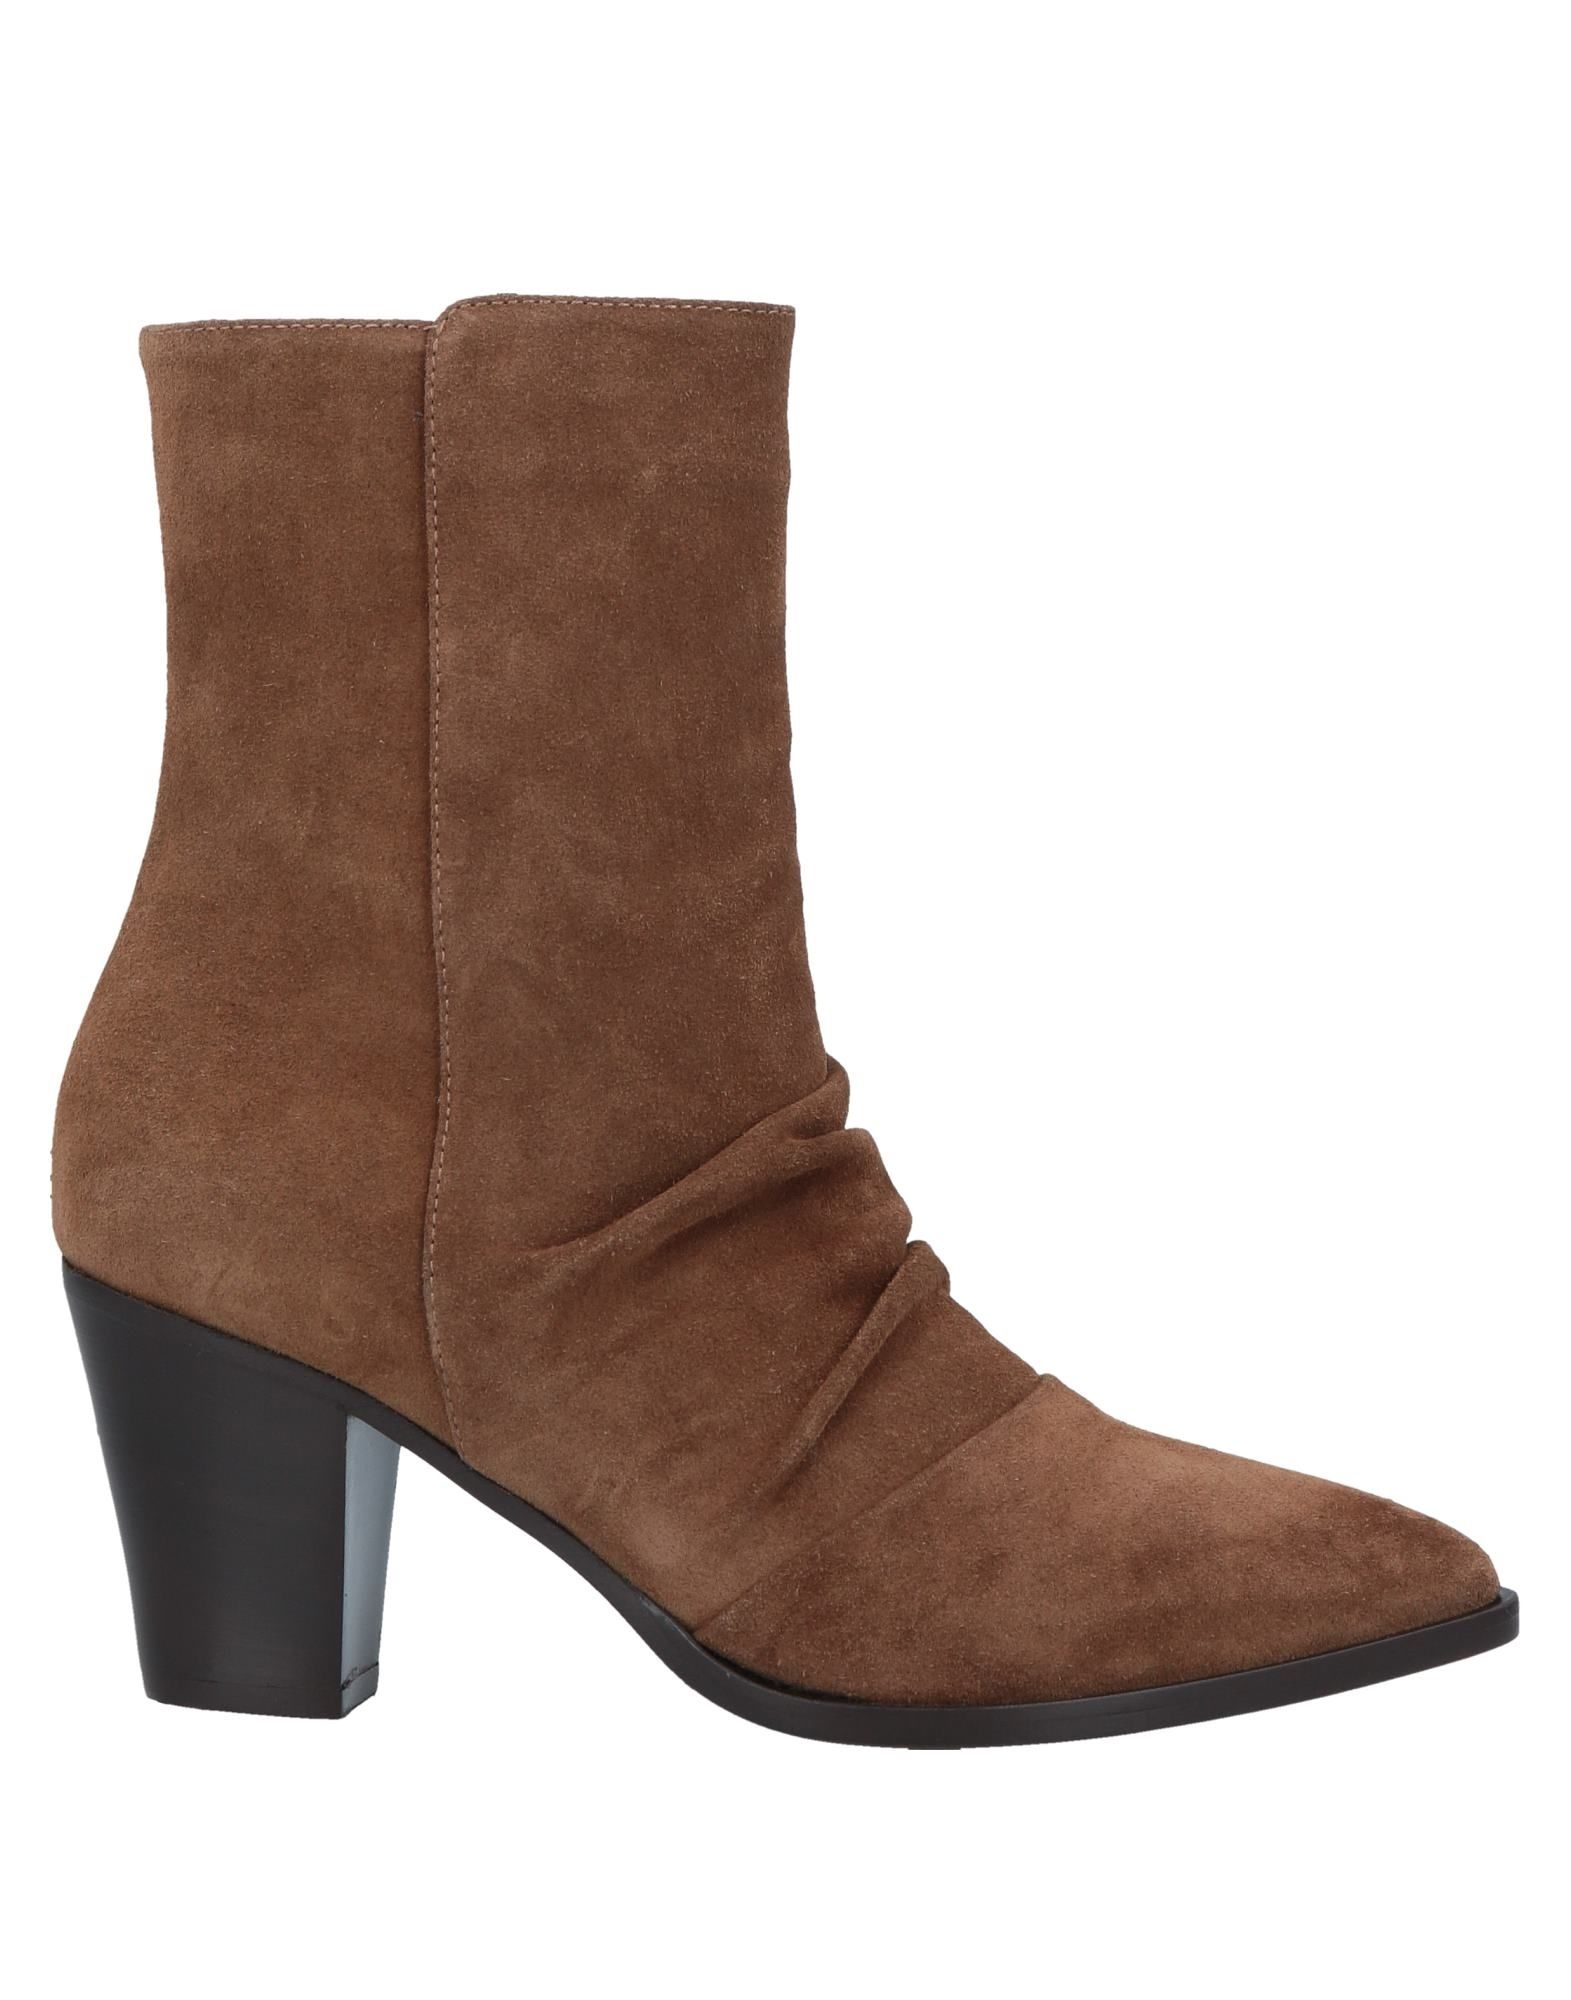 Alberto Fermani Boots Ankle boot